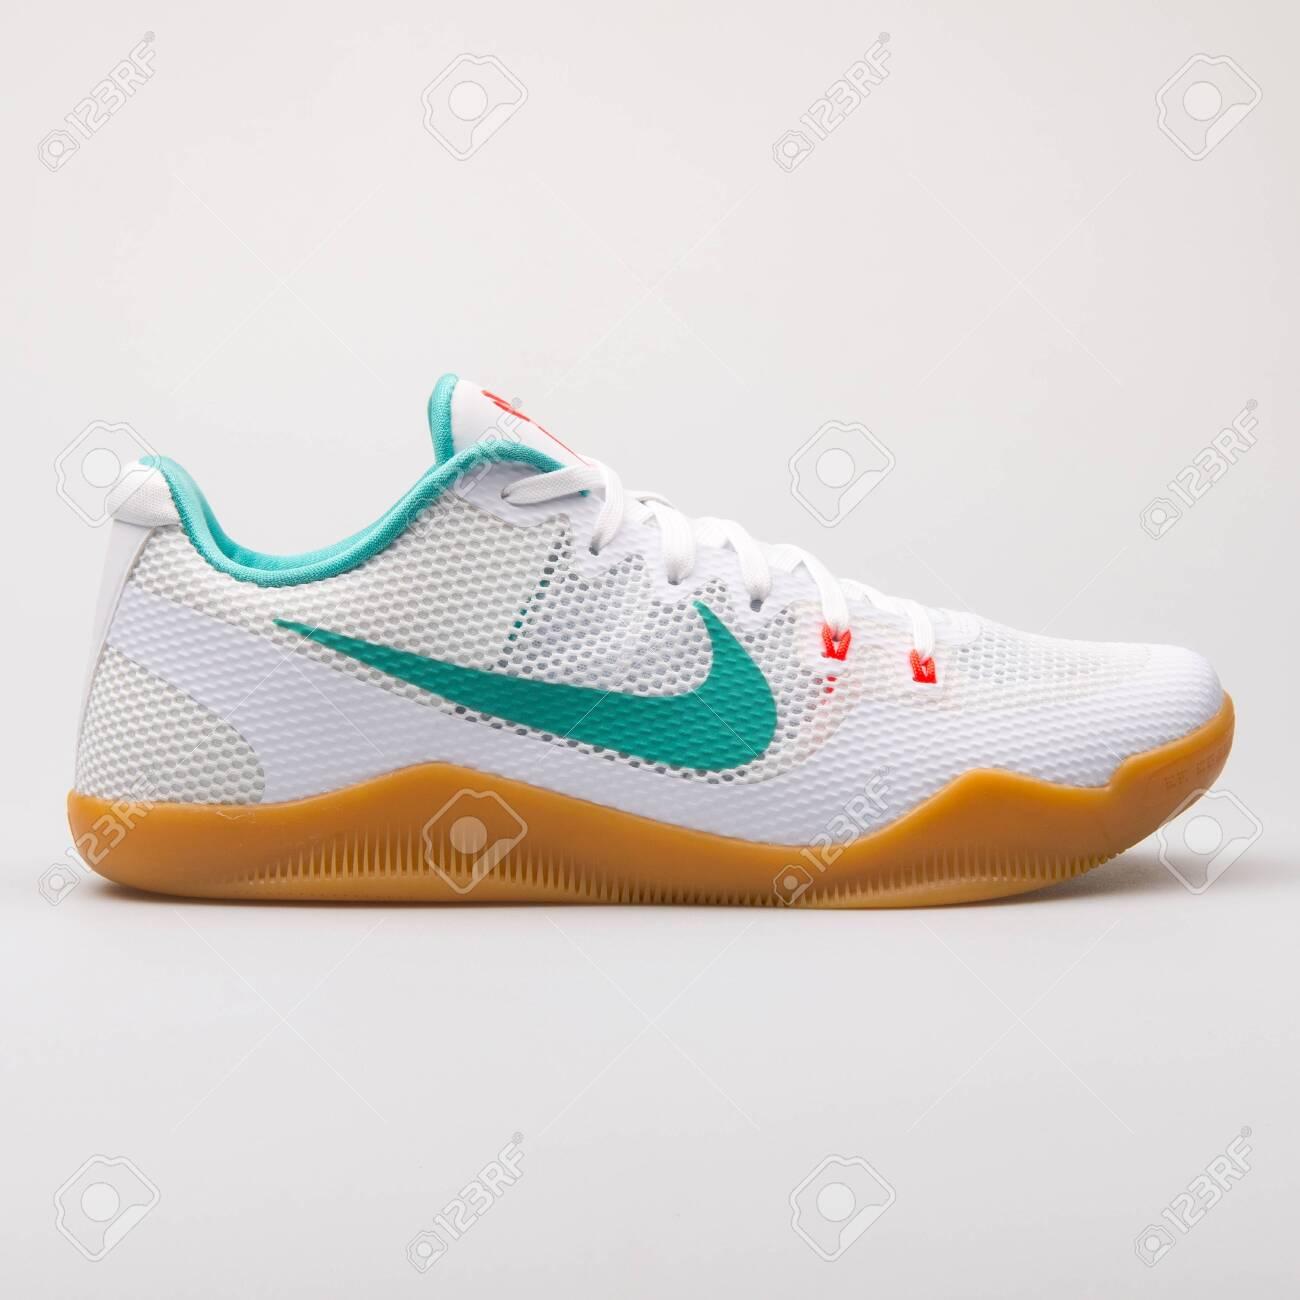 Nike Kobe XI White And Green.. Stock